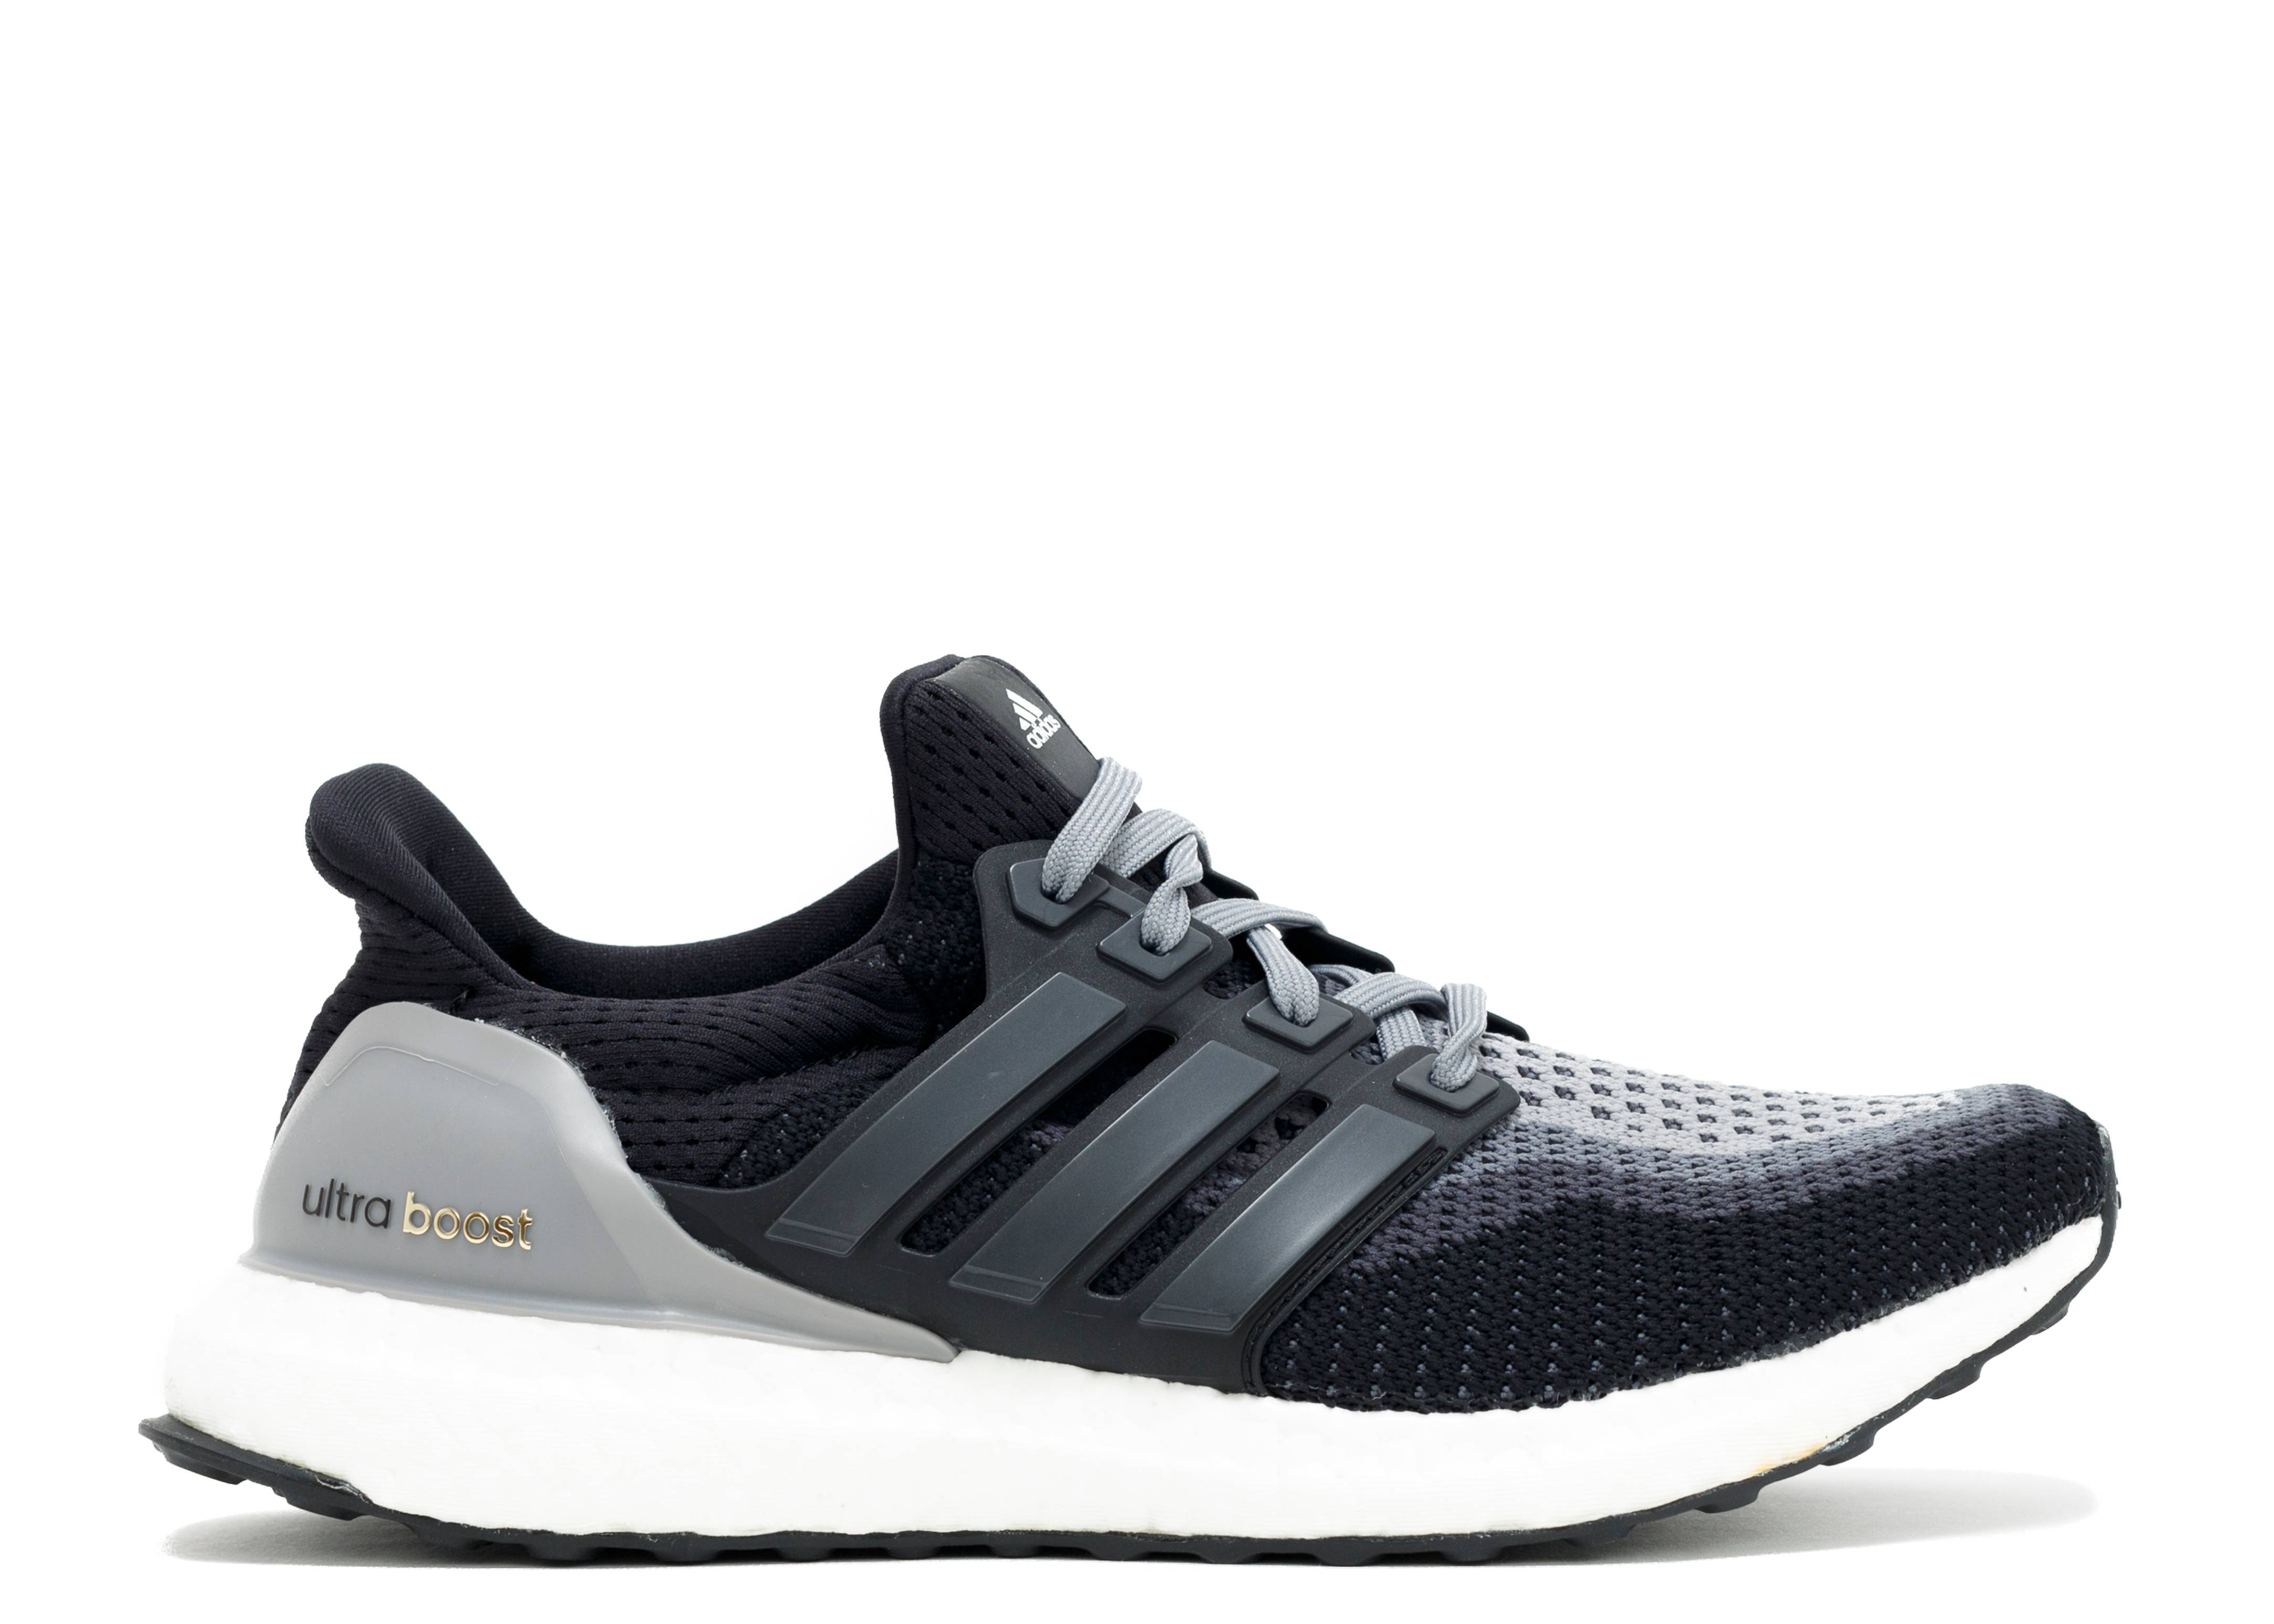 76367b9181f8d Ultra Boost W - Adidas - af5141 - core black  black grey